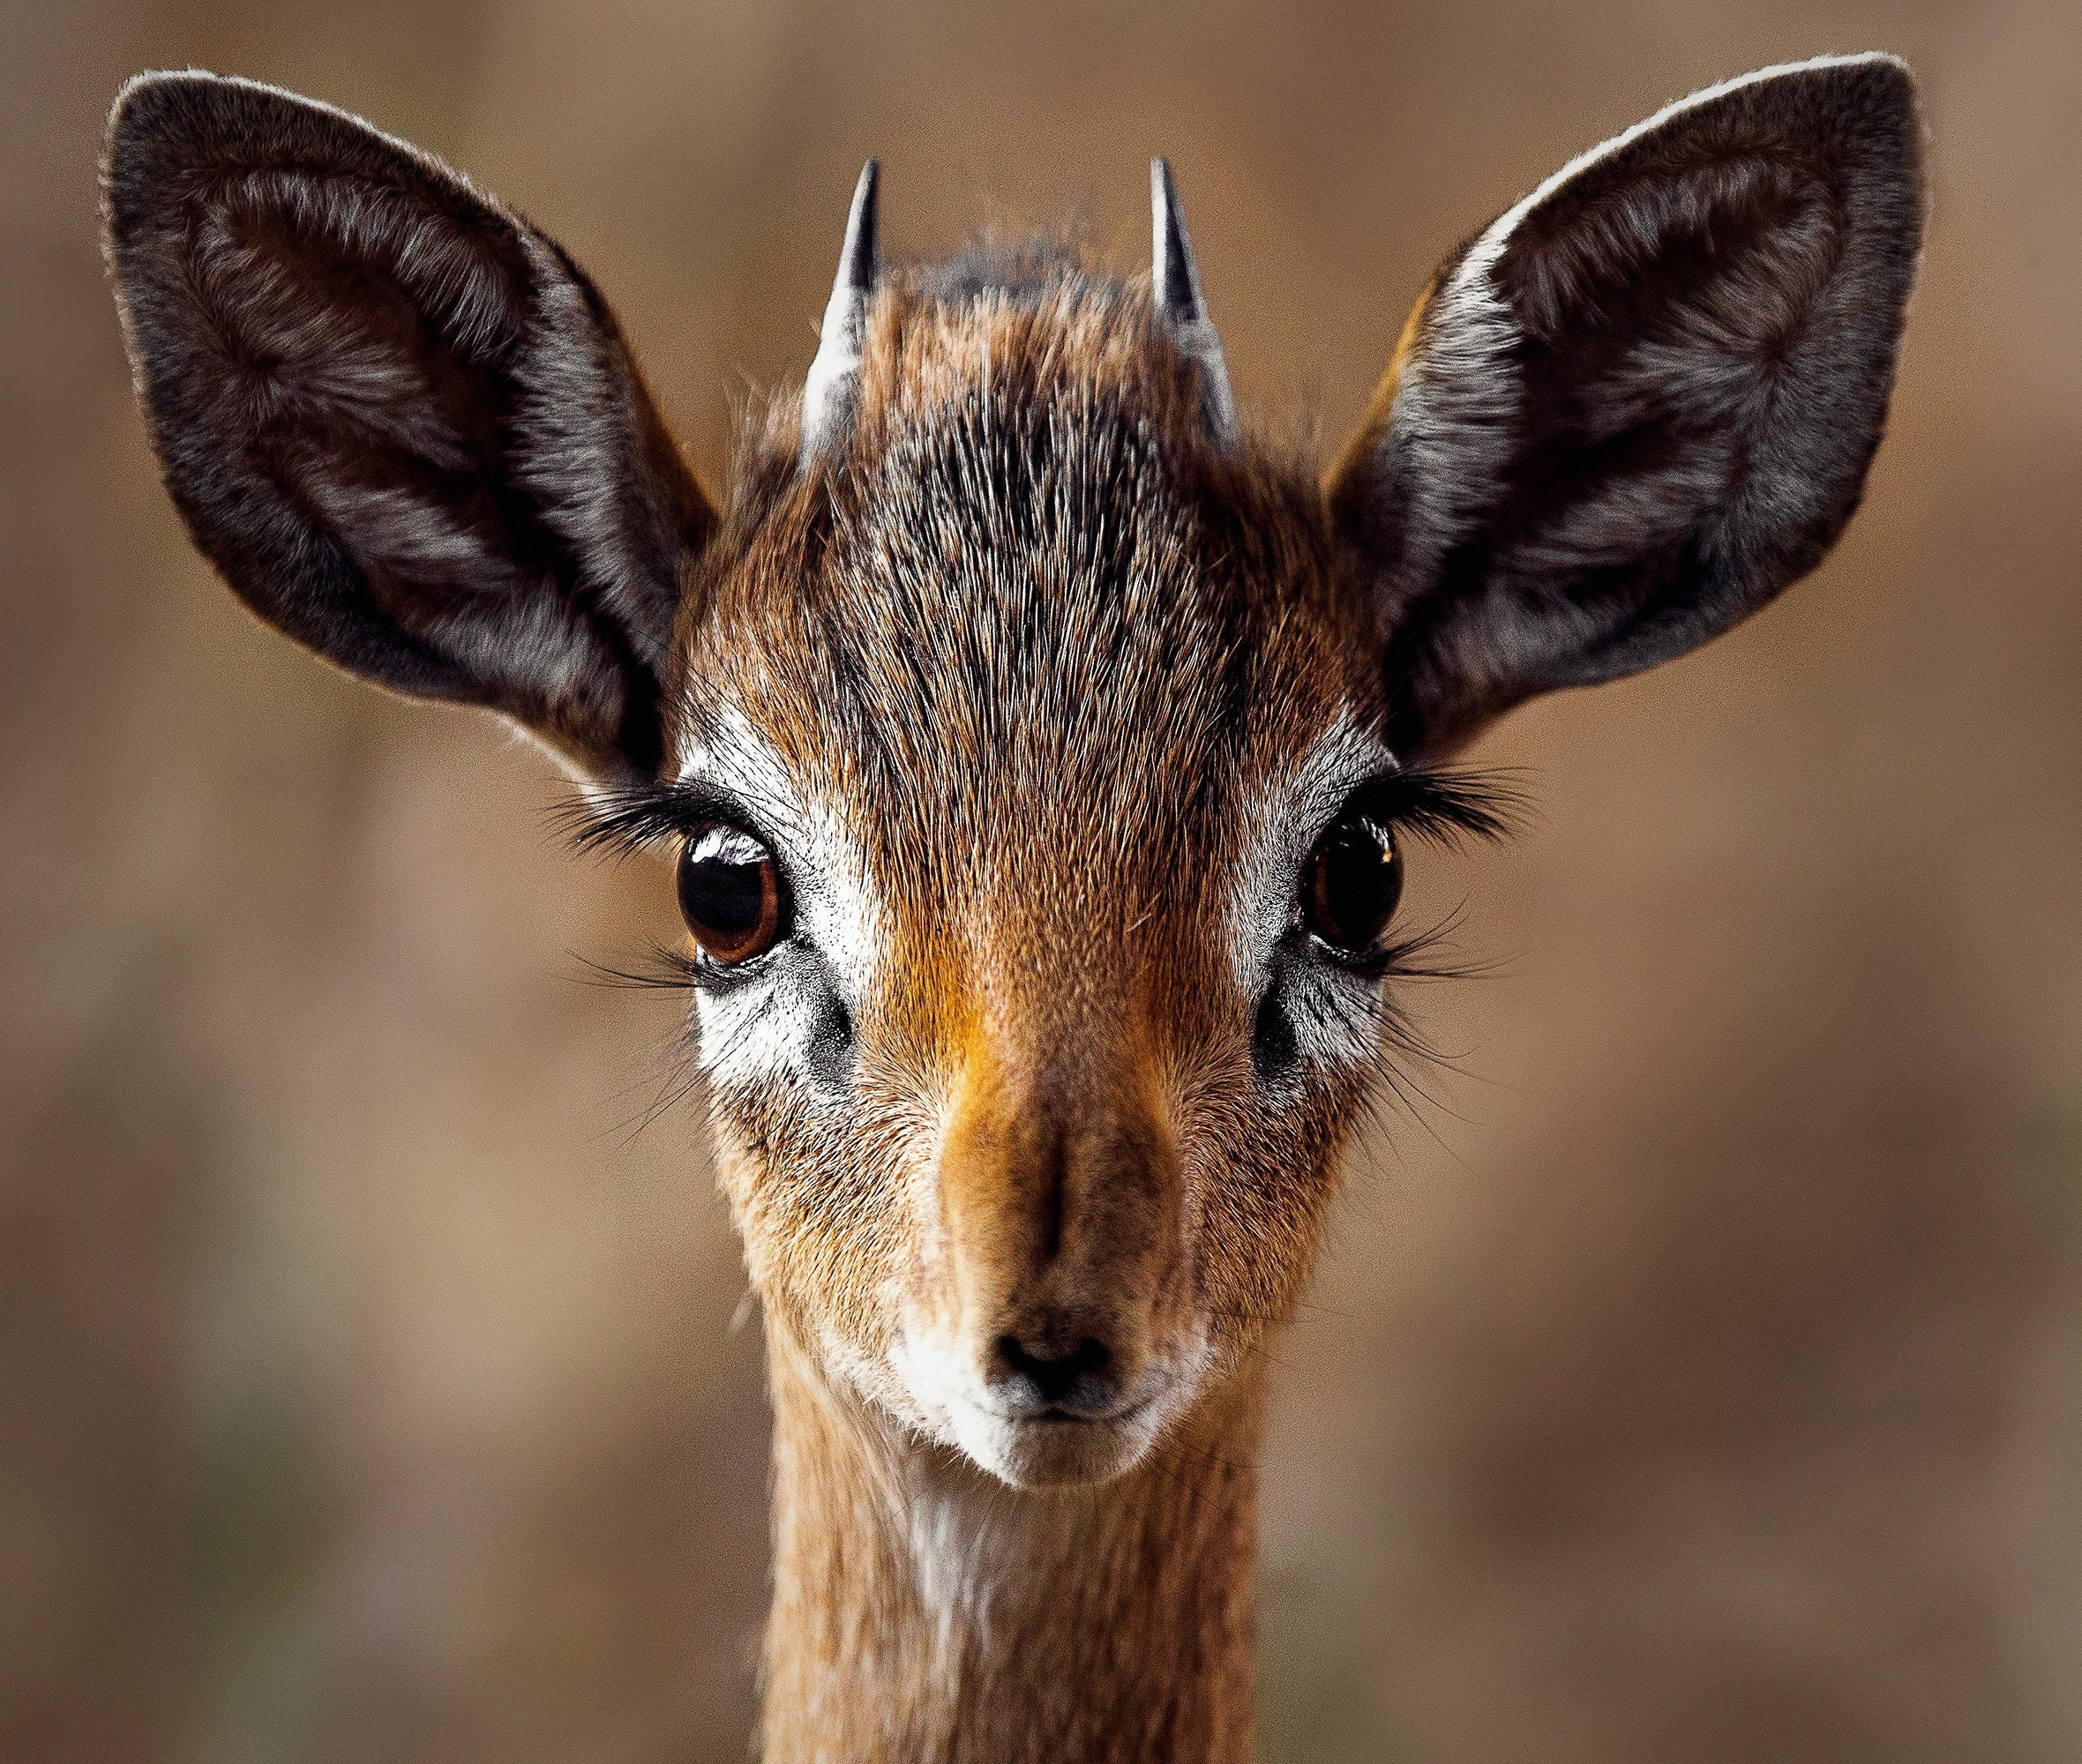 Close-up Portrait of a Antelope, Portrait, Outdoors, Safari, Wild animal, HQ Photo